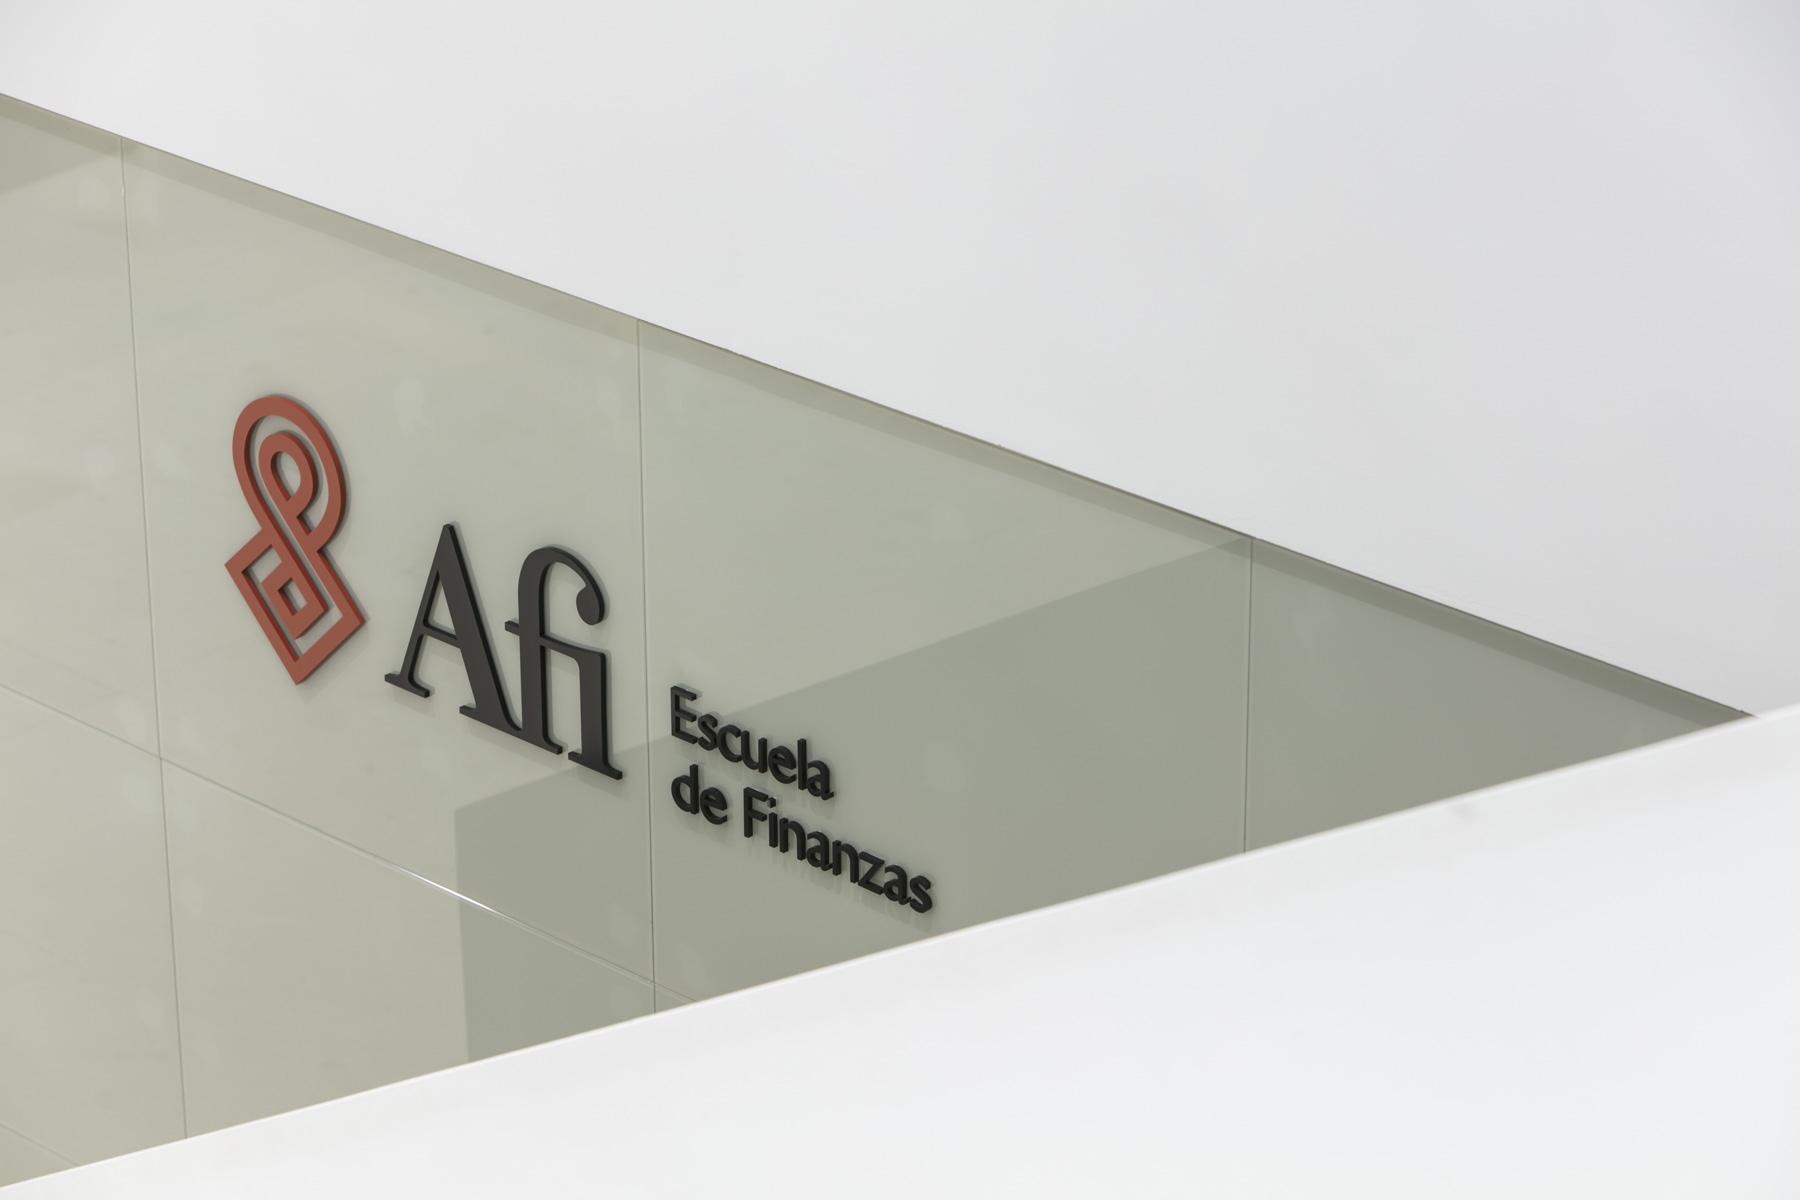 Afi Escuela de Finanzas